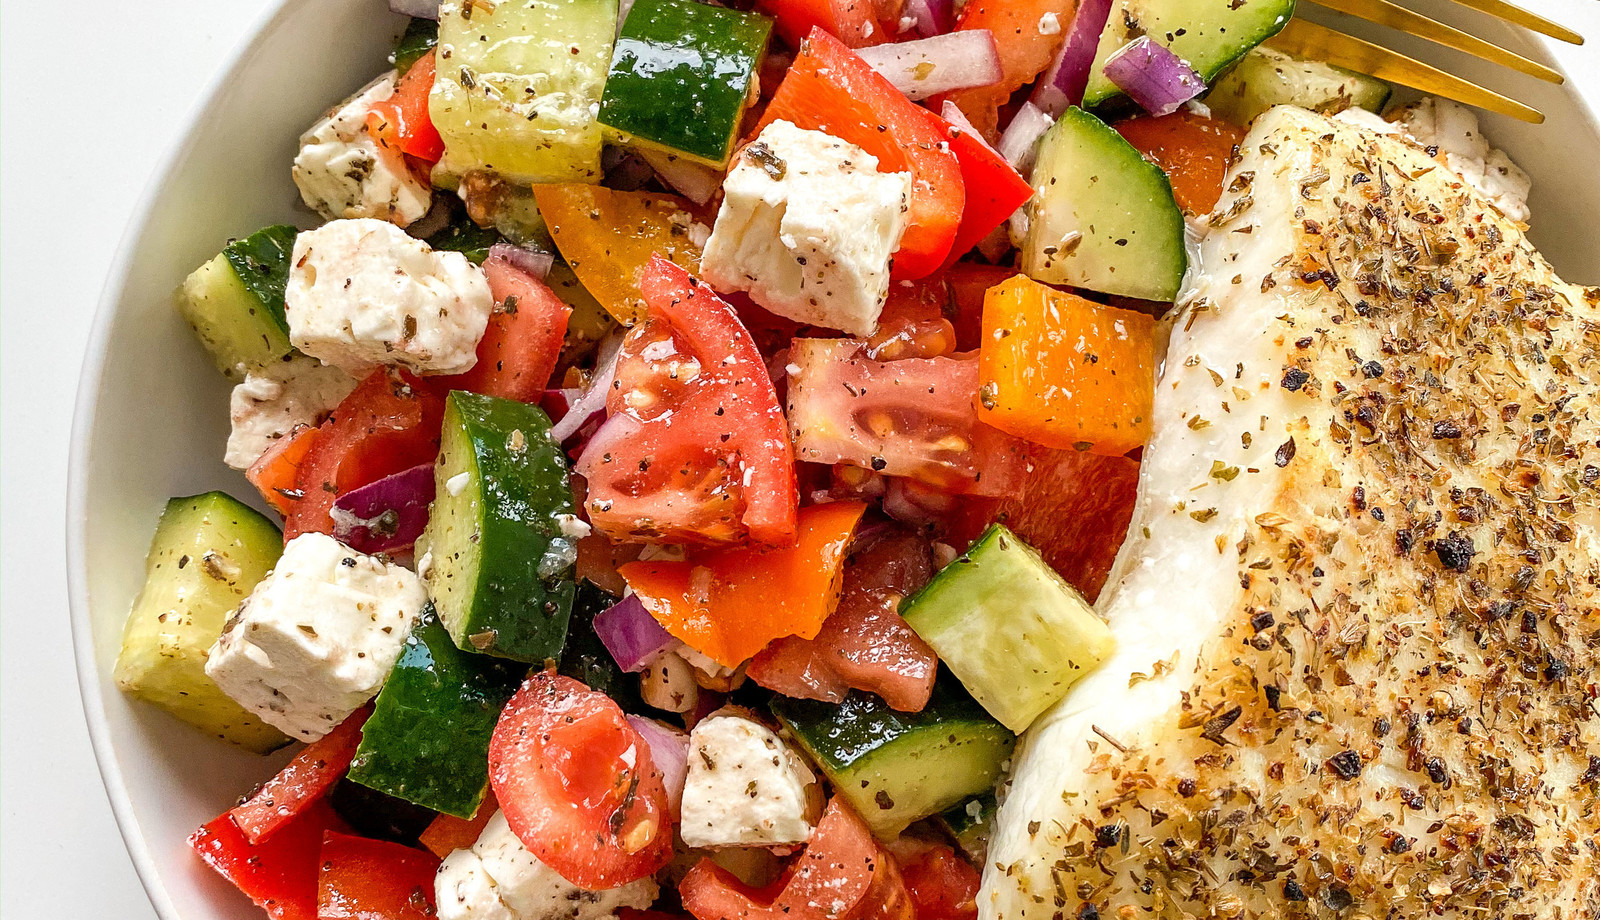 Mediterranean Style Alaskan Halibut with a Village Greek Salad